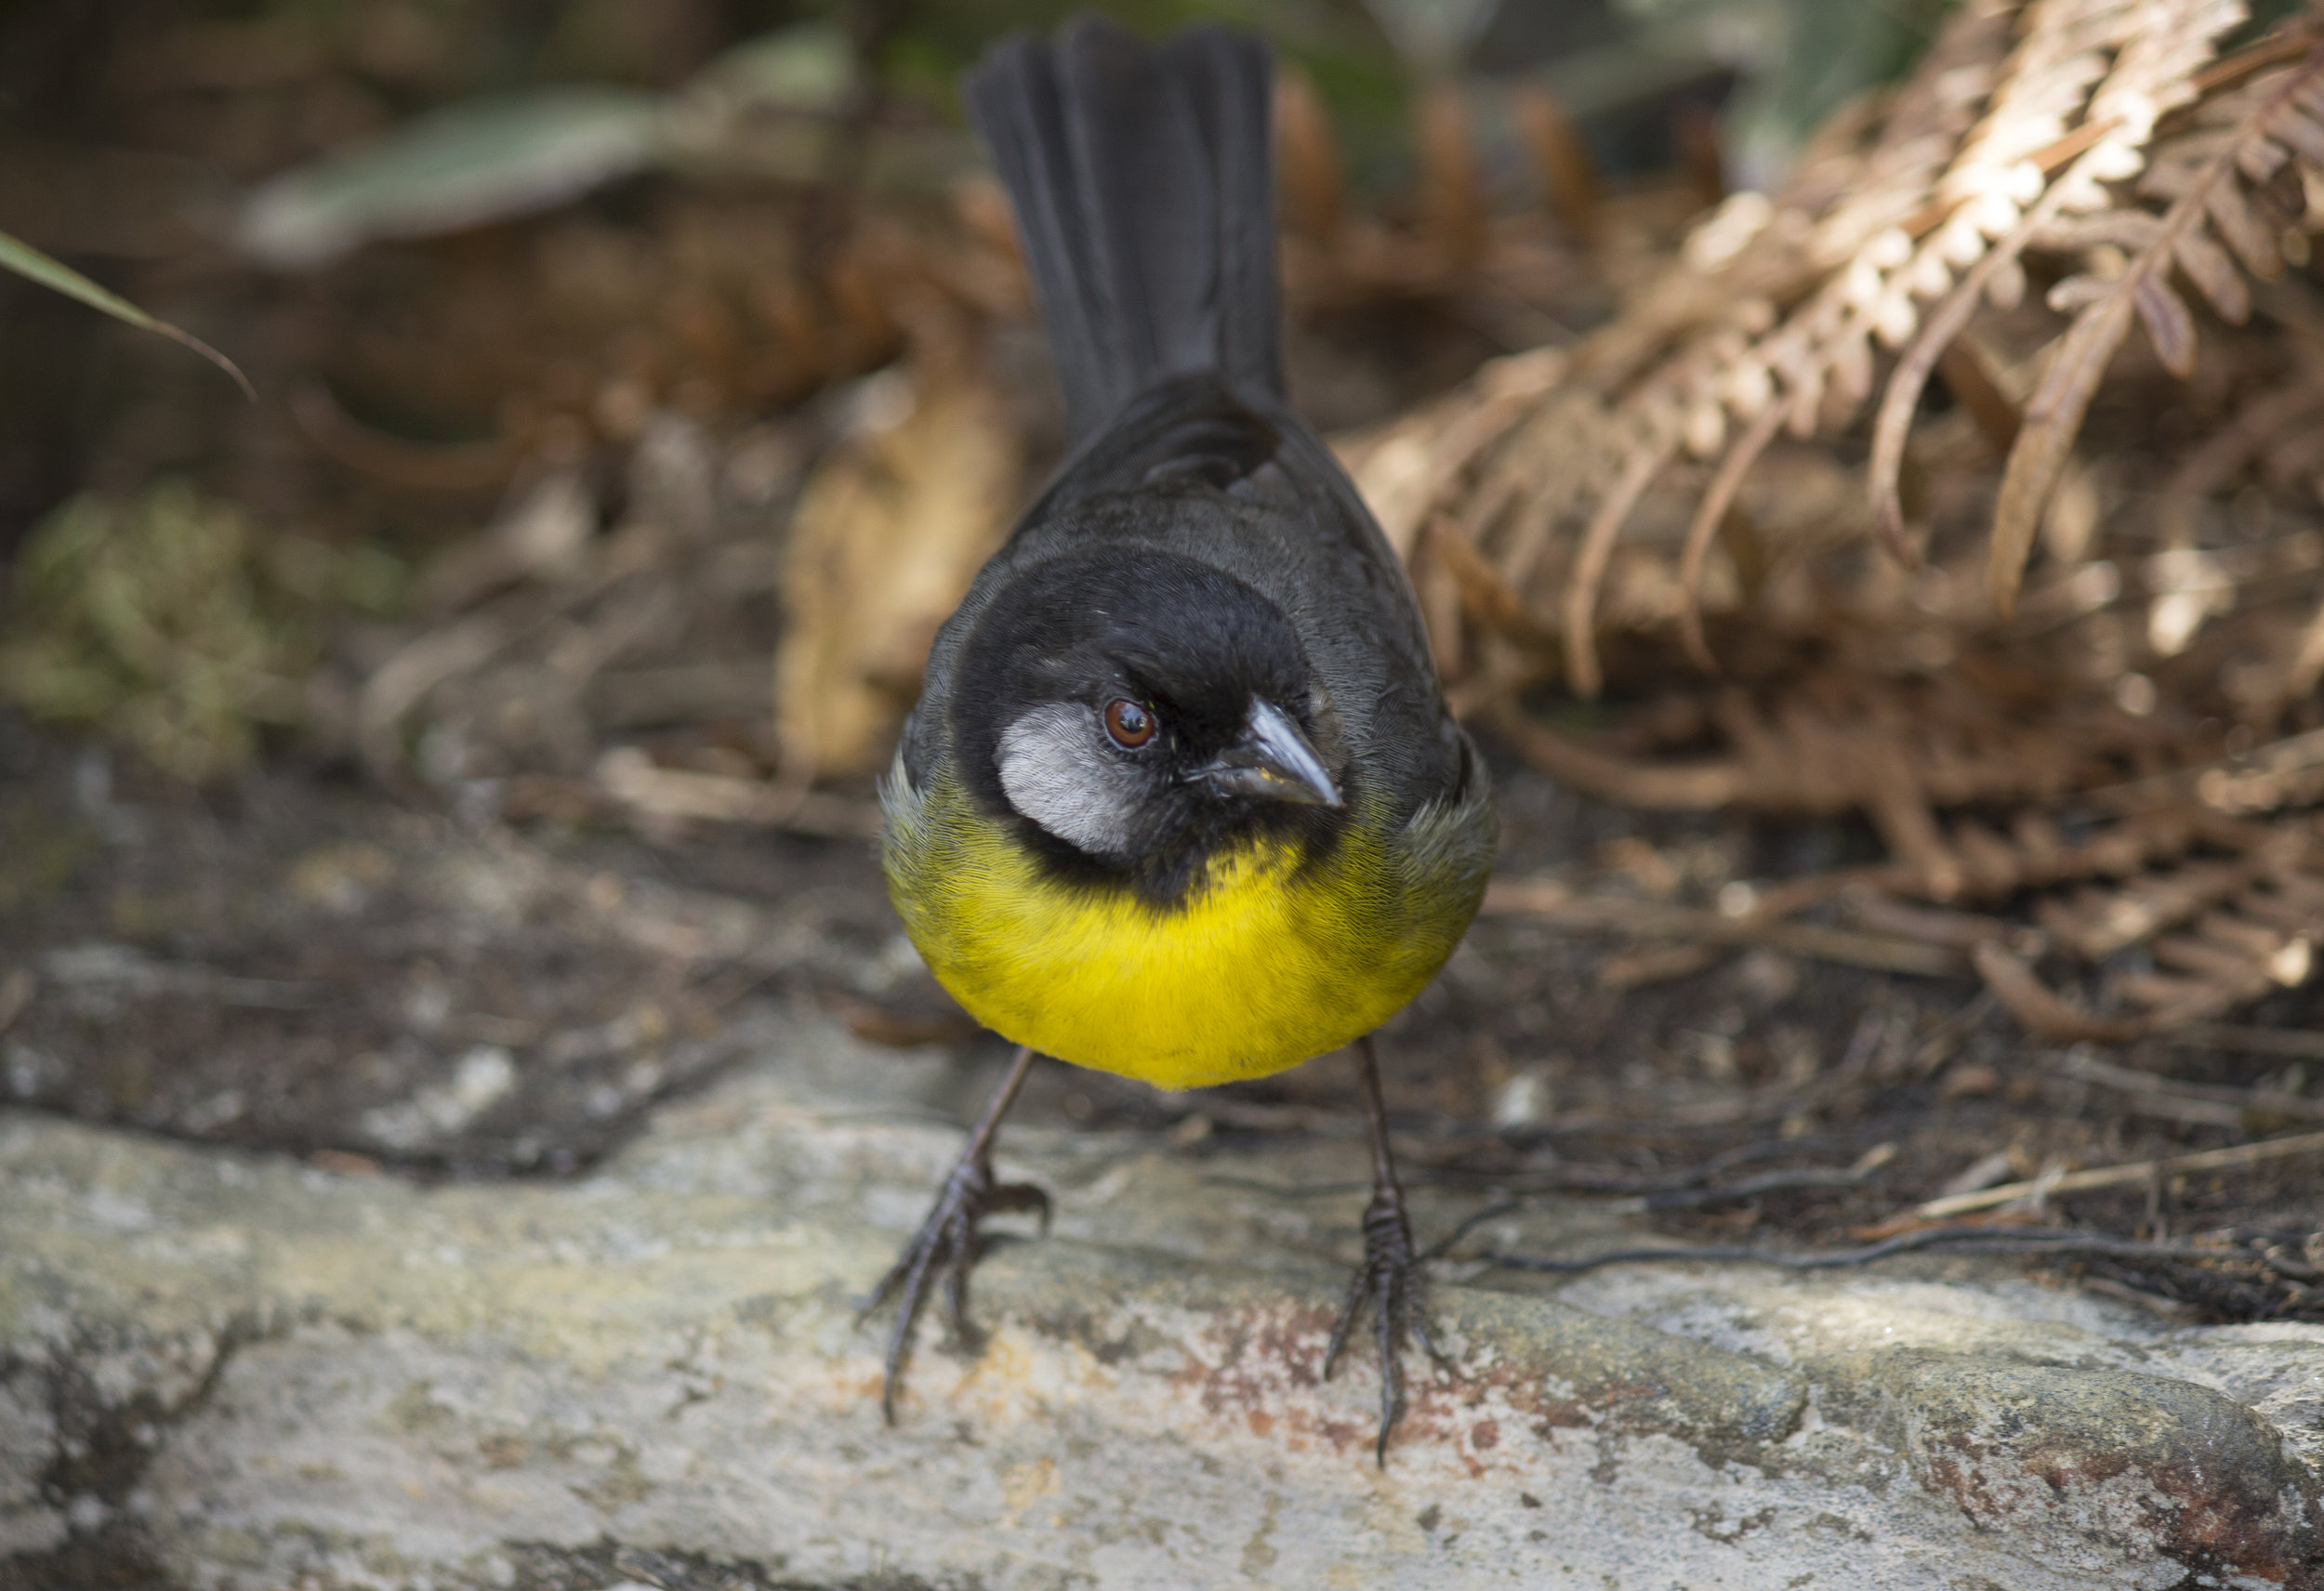 Santa-Marta-Brush-Finch-Atlapetes-melanocephalus-Cuchilla-San-Lorenzo-Sierra-Nevada-de-Santa-Marta-Copyright-Colombian-Project-5.jpg